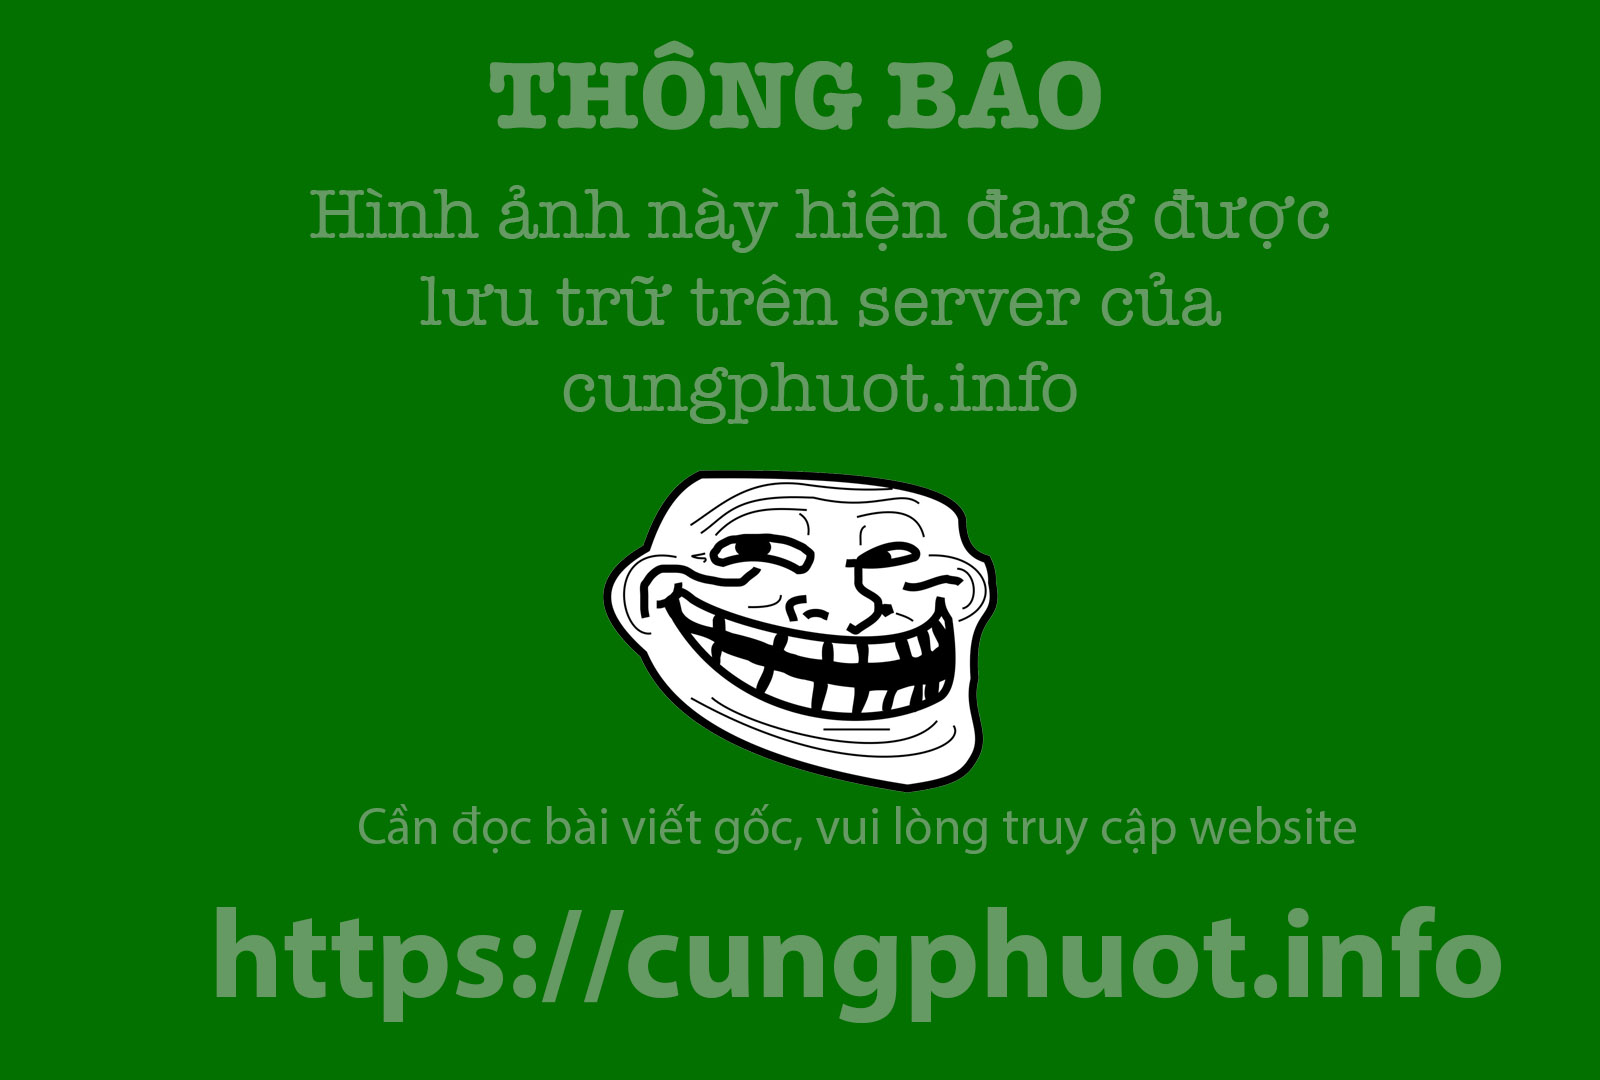 nhung-tiem-ca-phe-dep-phai-di-mot-lan-cho-biet-o-da-nang-ivivu-4